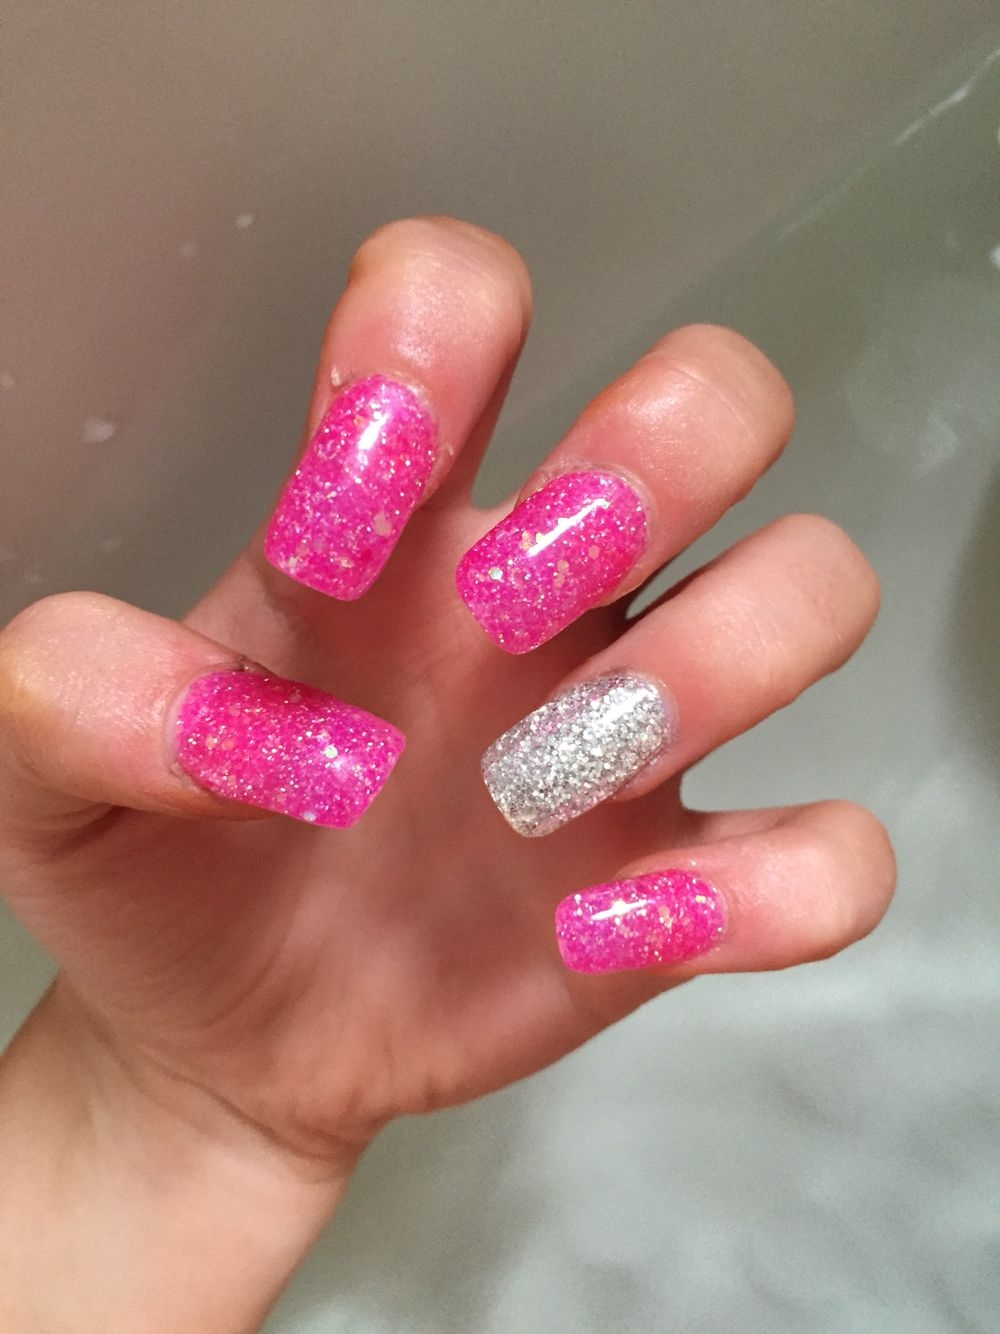 pink #silver #acrylic #nails #extensions #long | Nails | Pinterest ...